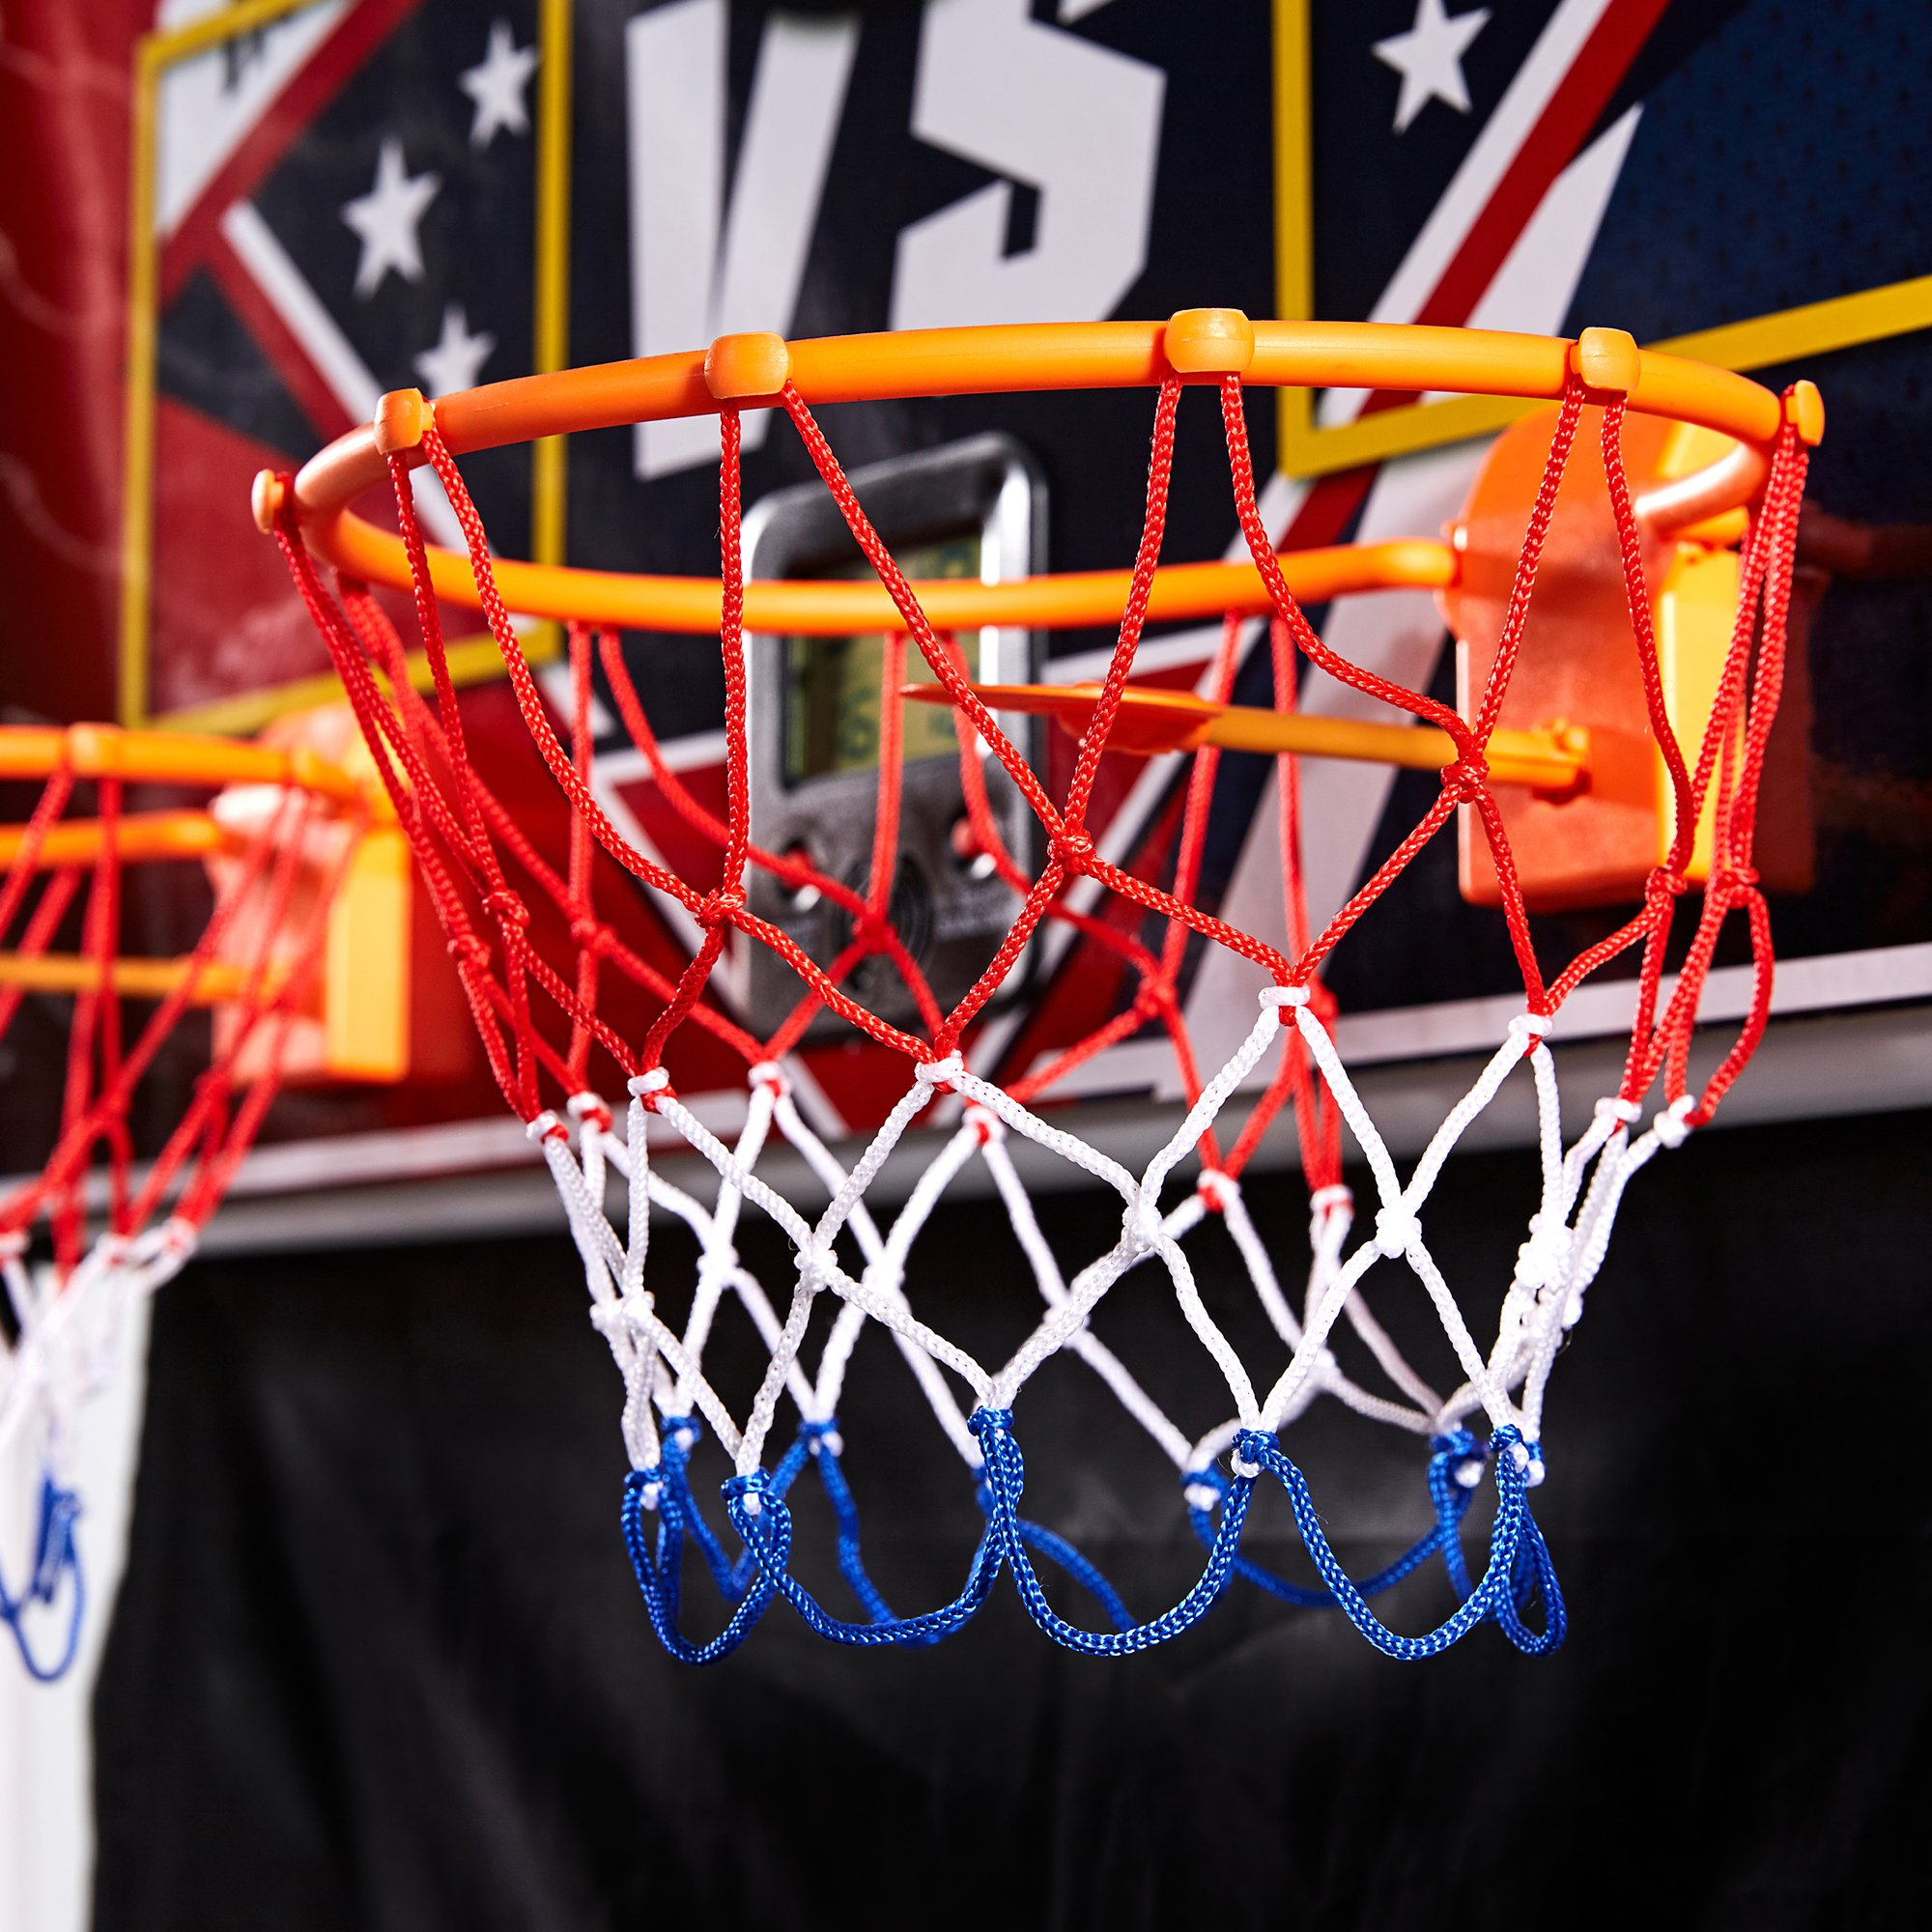 Lancaster 2 Player Junior Indoor Arcade Basketball Dual Hoop Shooting Game Set  - image 4 of 6